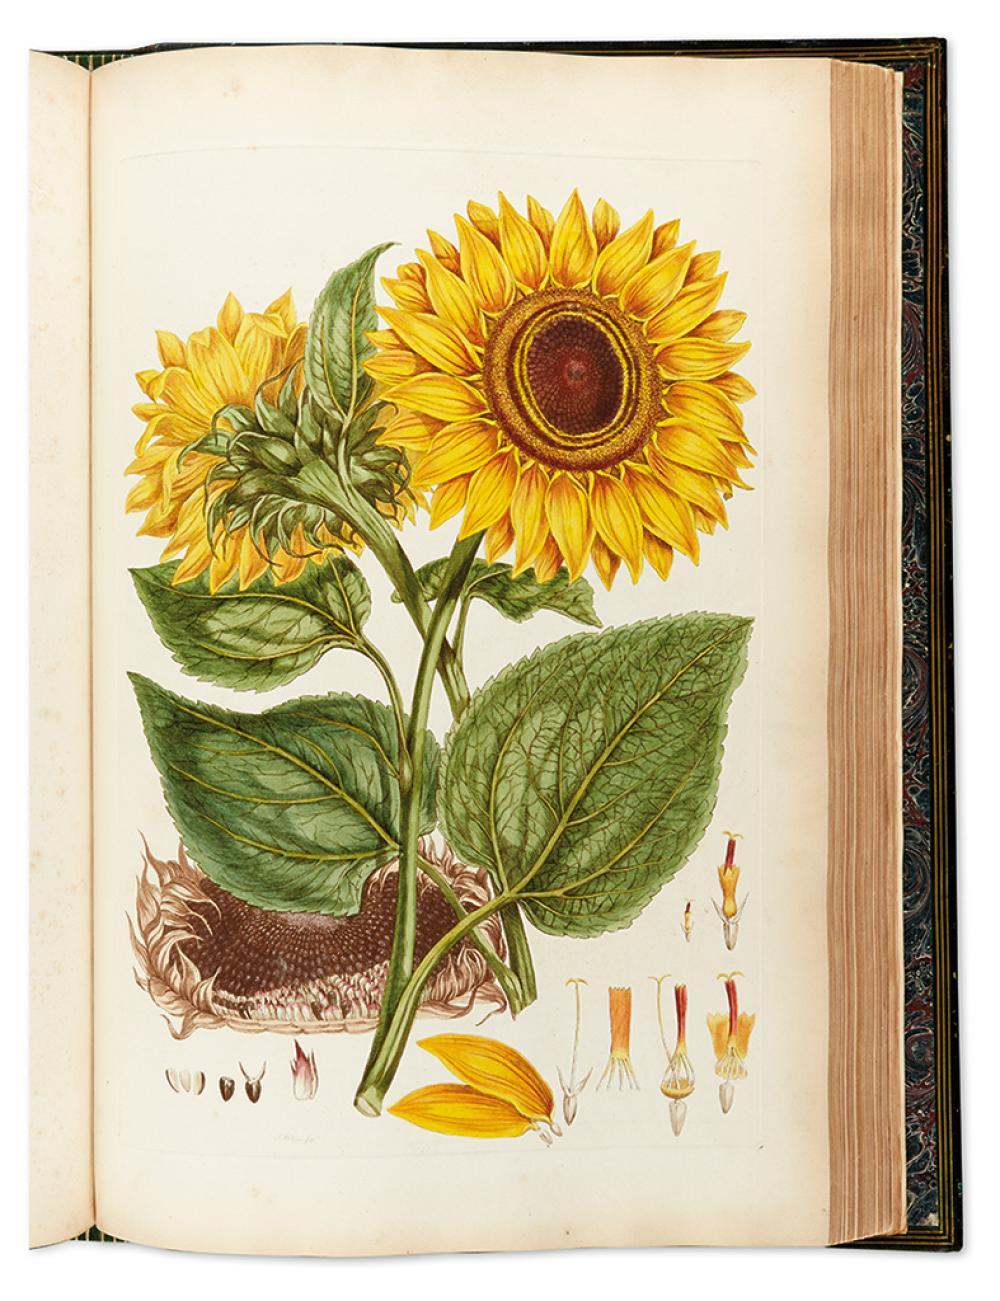 MILLER, JOHN. Illustratio Systematis Sexualis Linnaei... An Illustration of the Sexual System of Linnaeus.